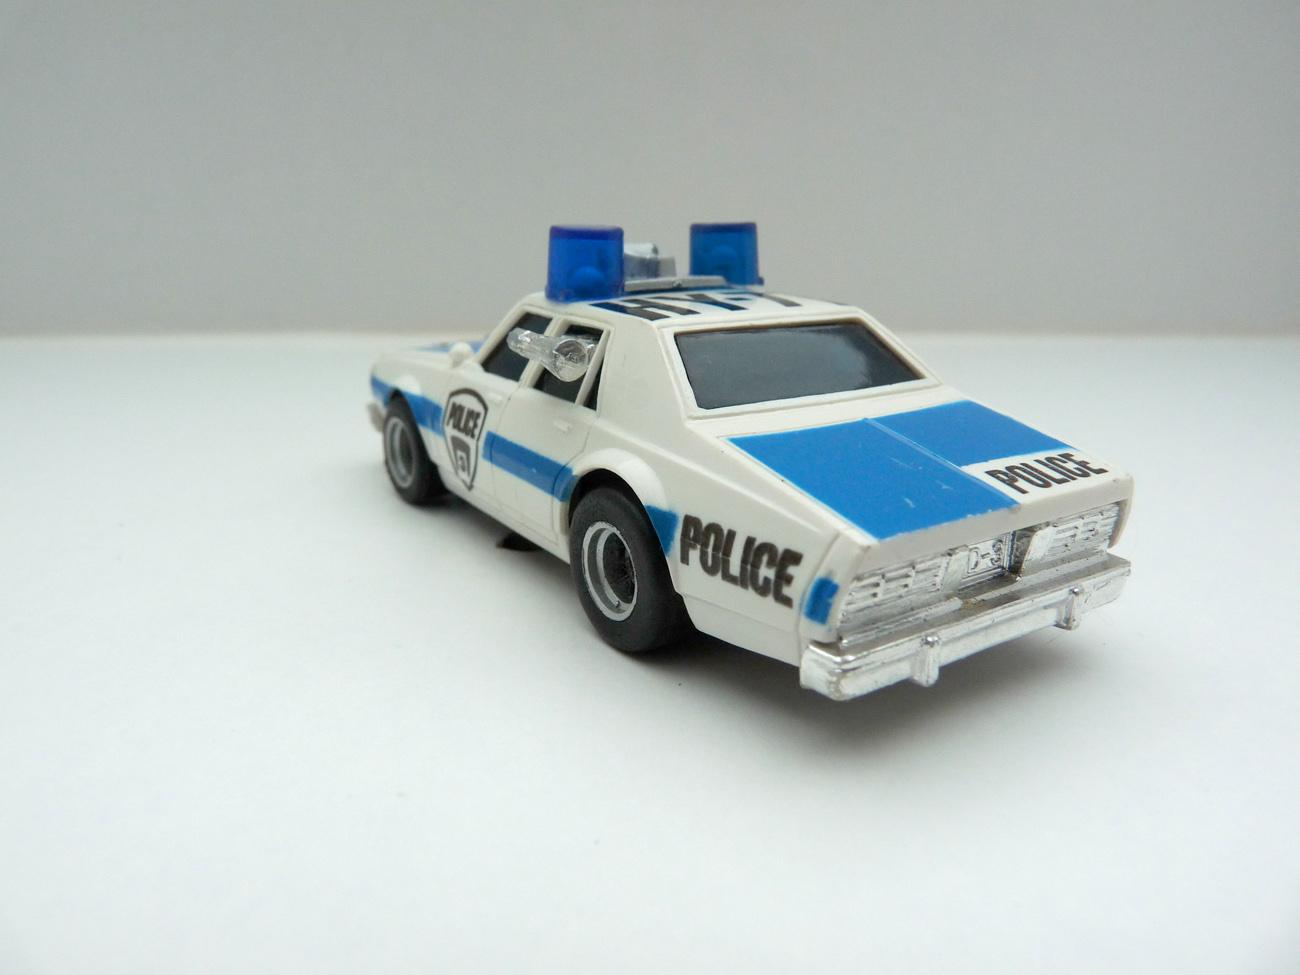 AURORA AFX Police Car HY-71 weiß/blau Variante 3